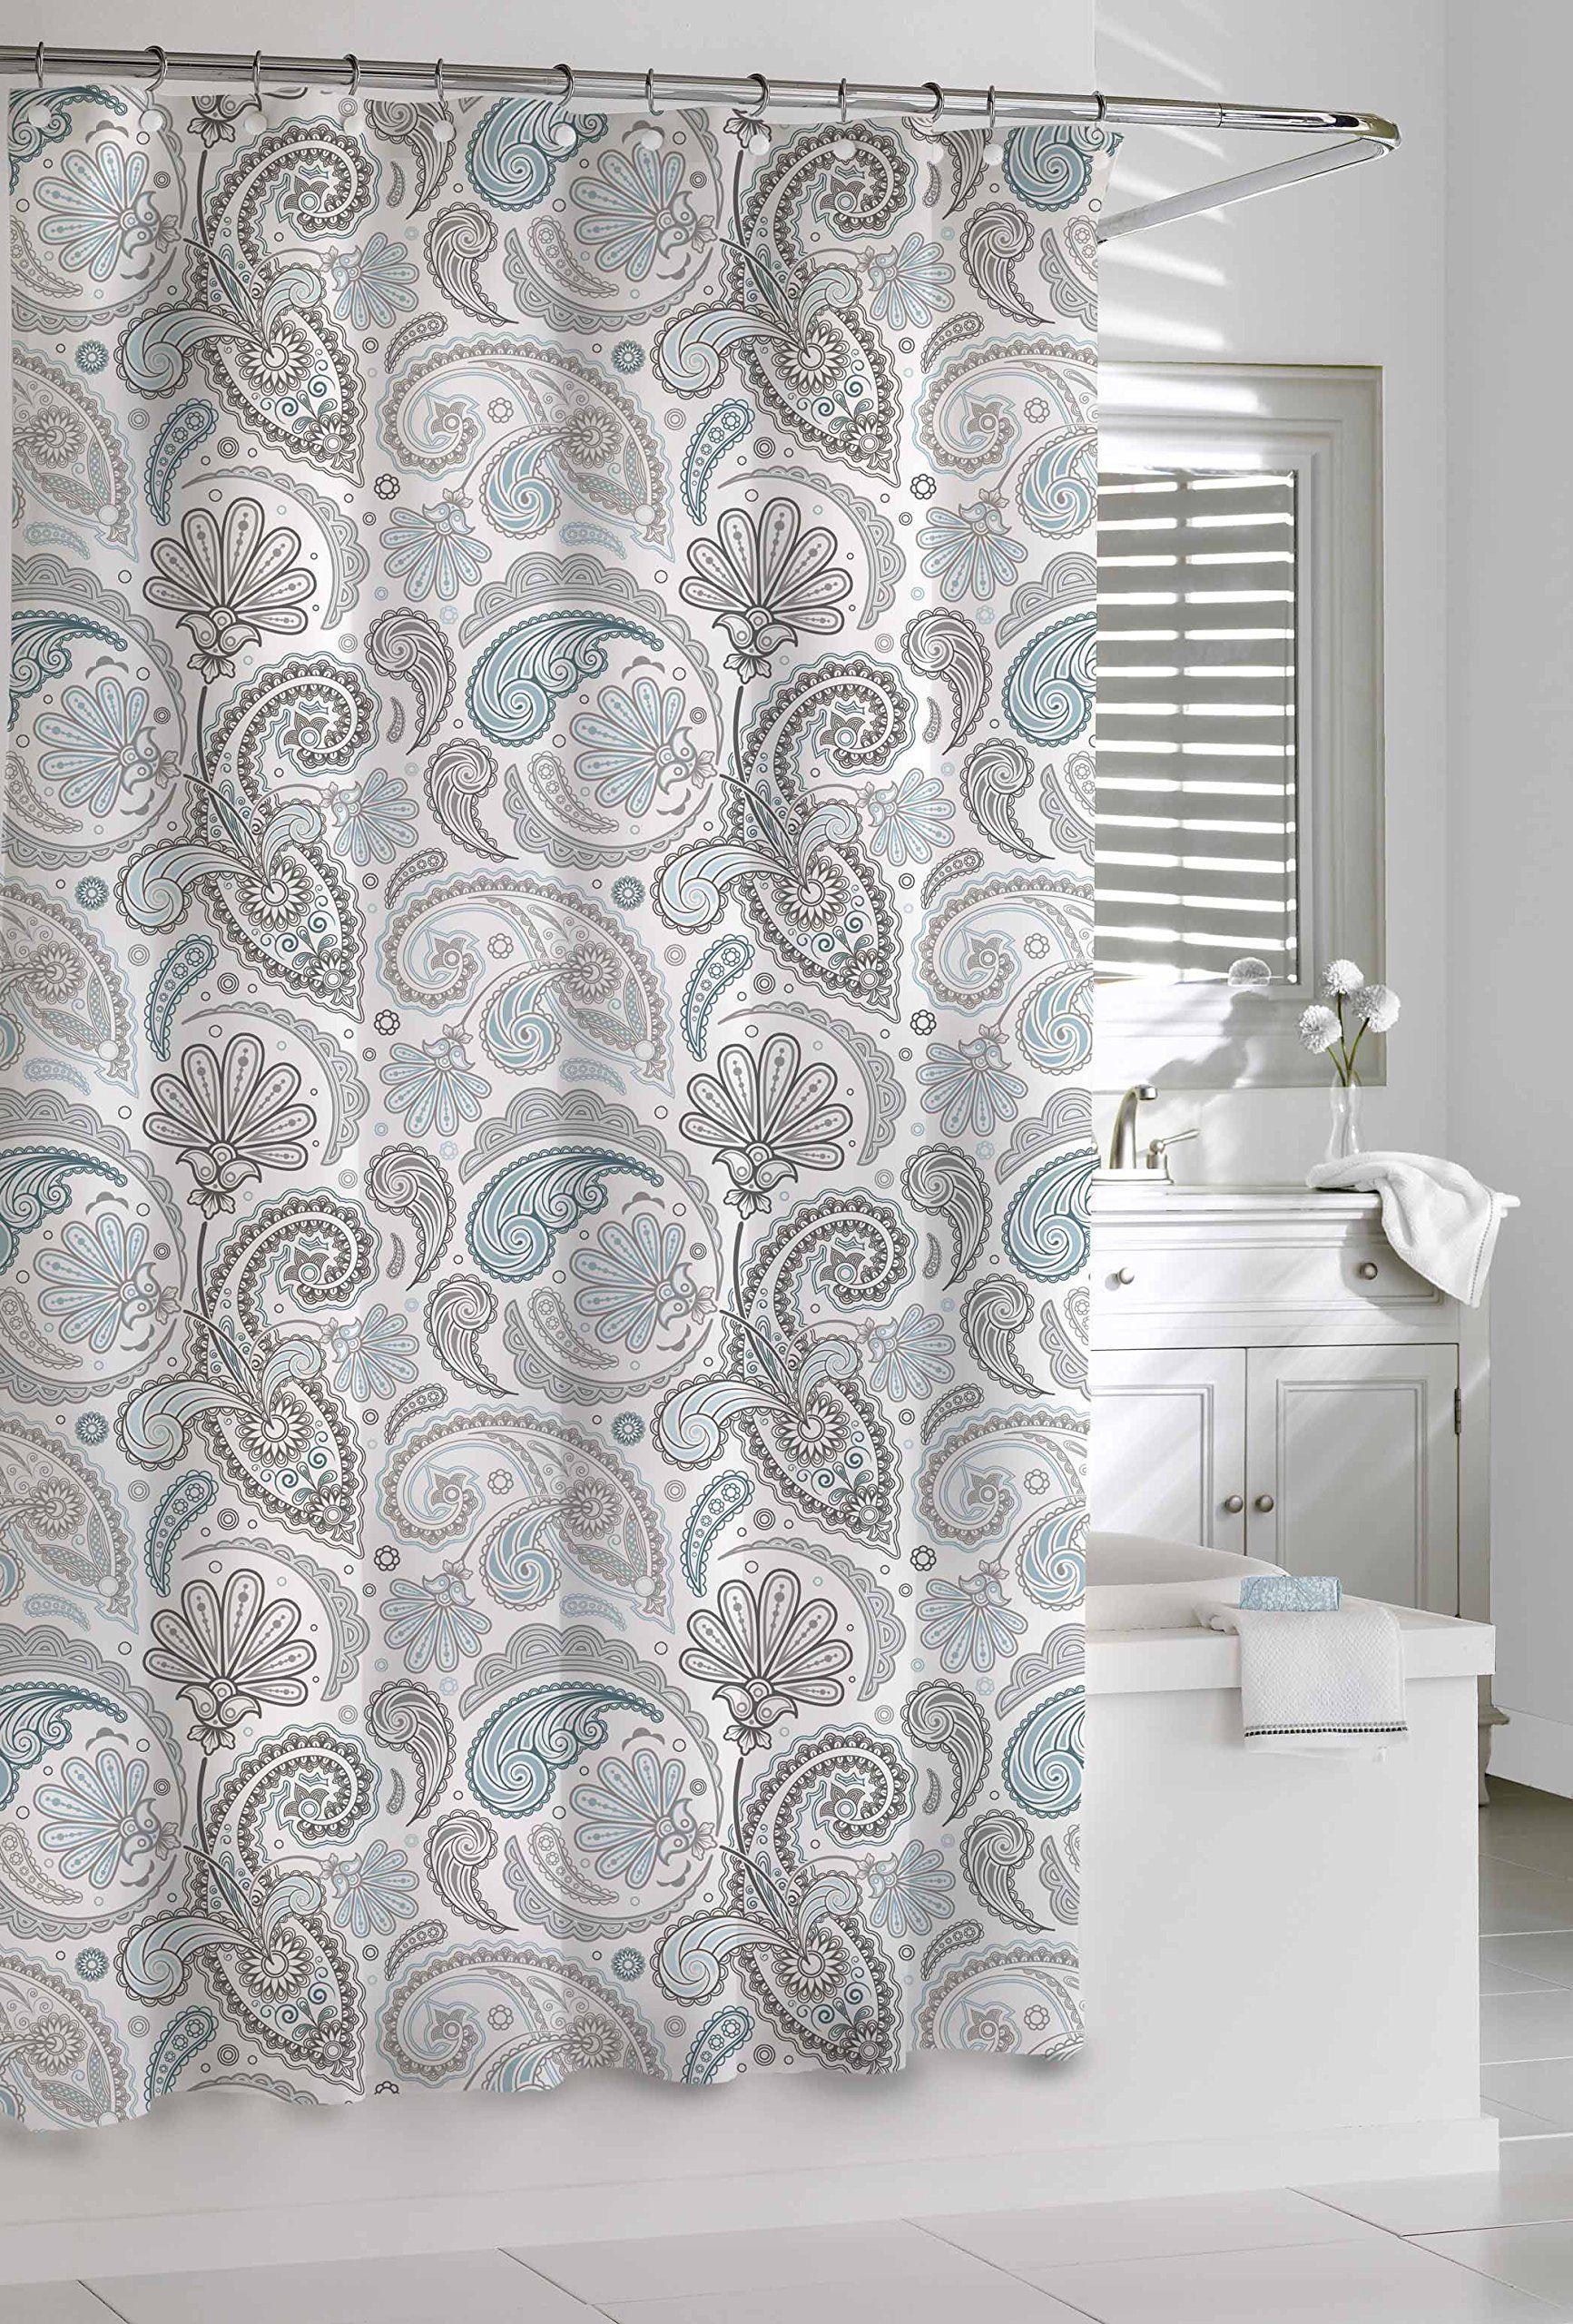 Kassatex Sps 115 Bgr Paisley Shower Curtain Blue Grey 72 By 72 Inch Paisley Shower Curtain Gray Shower Curtains Shower Curtain